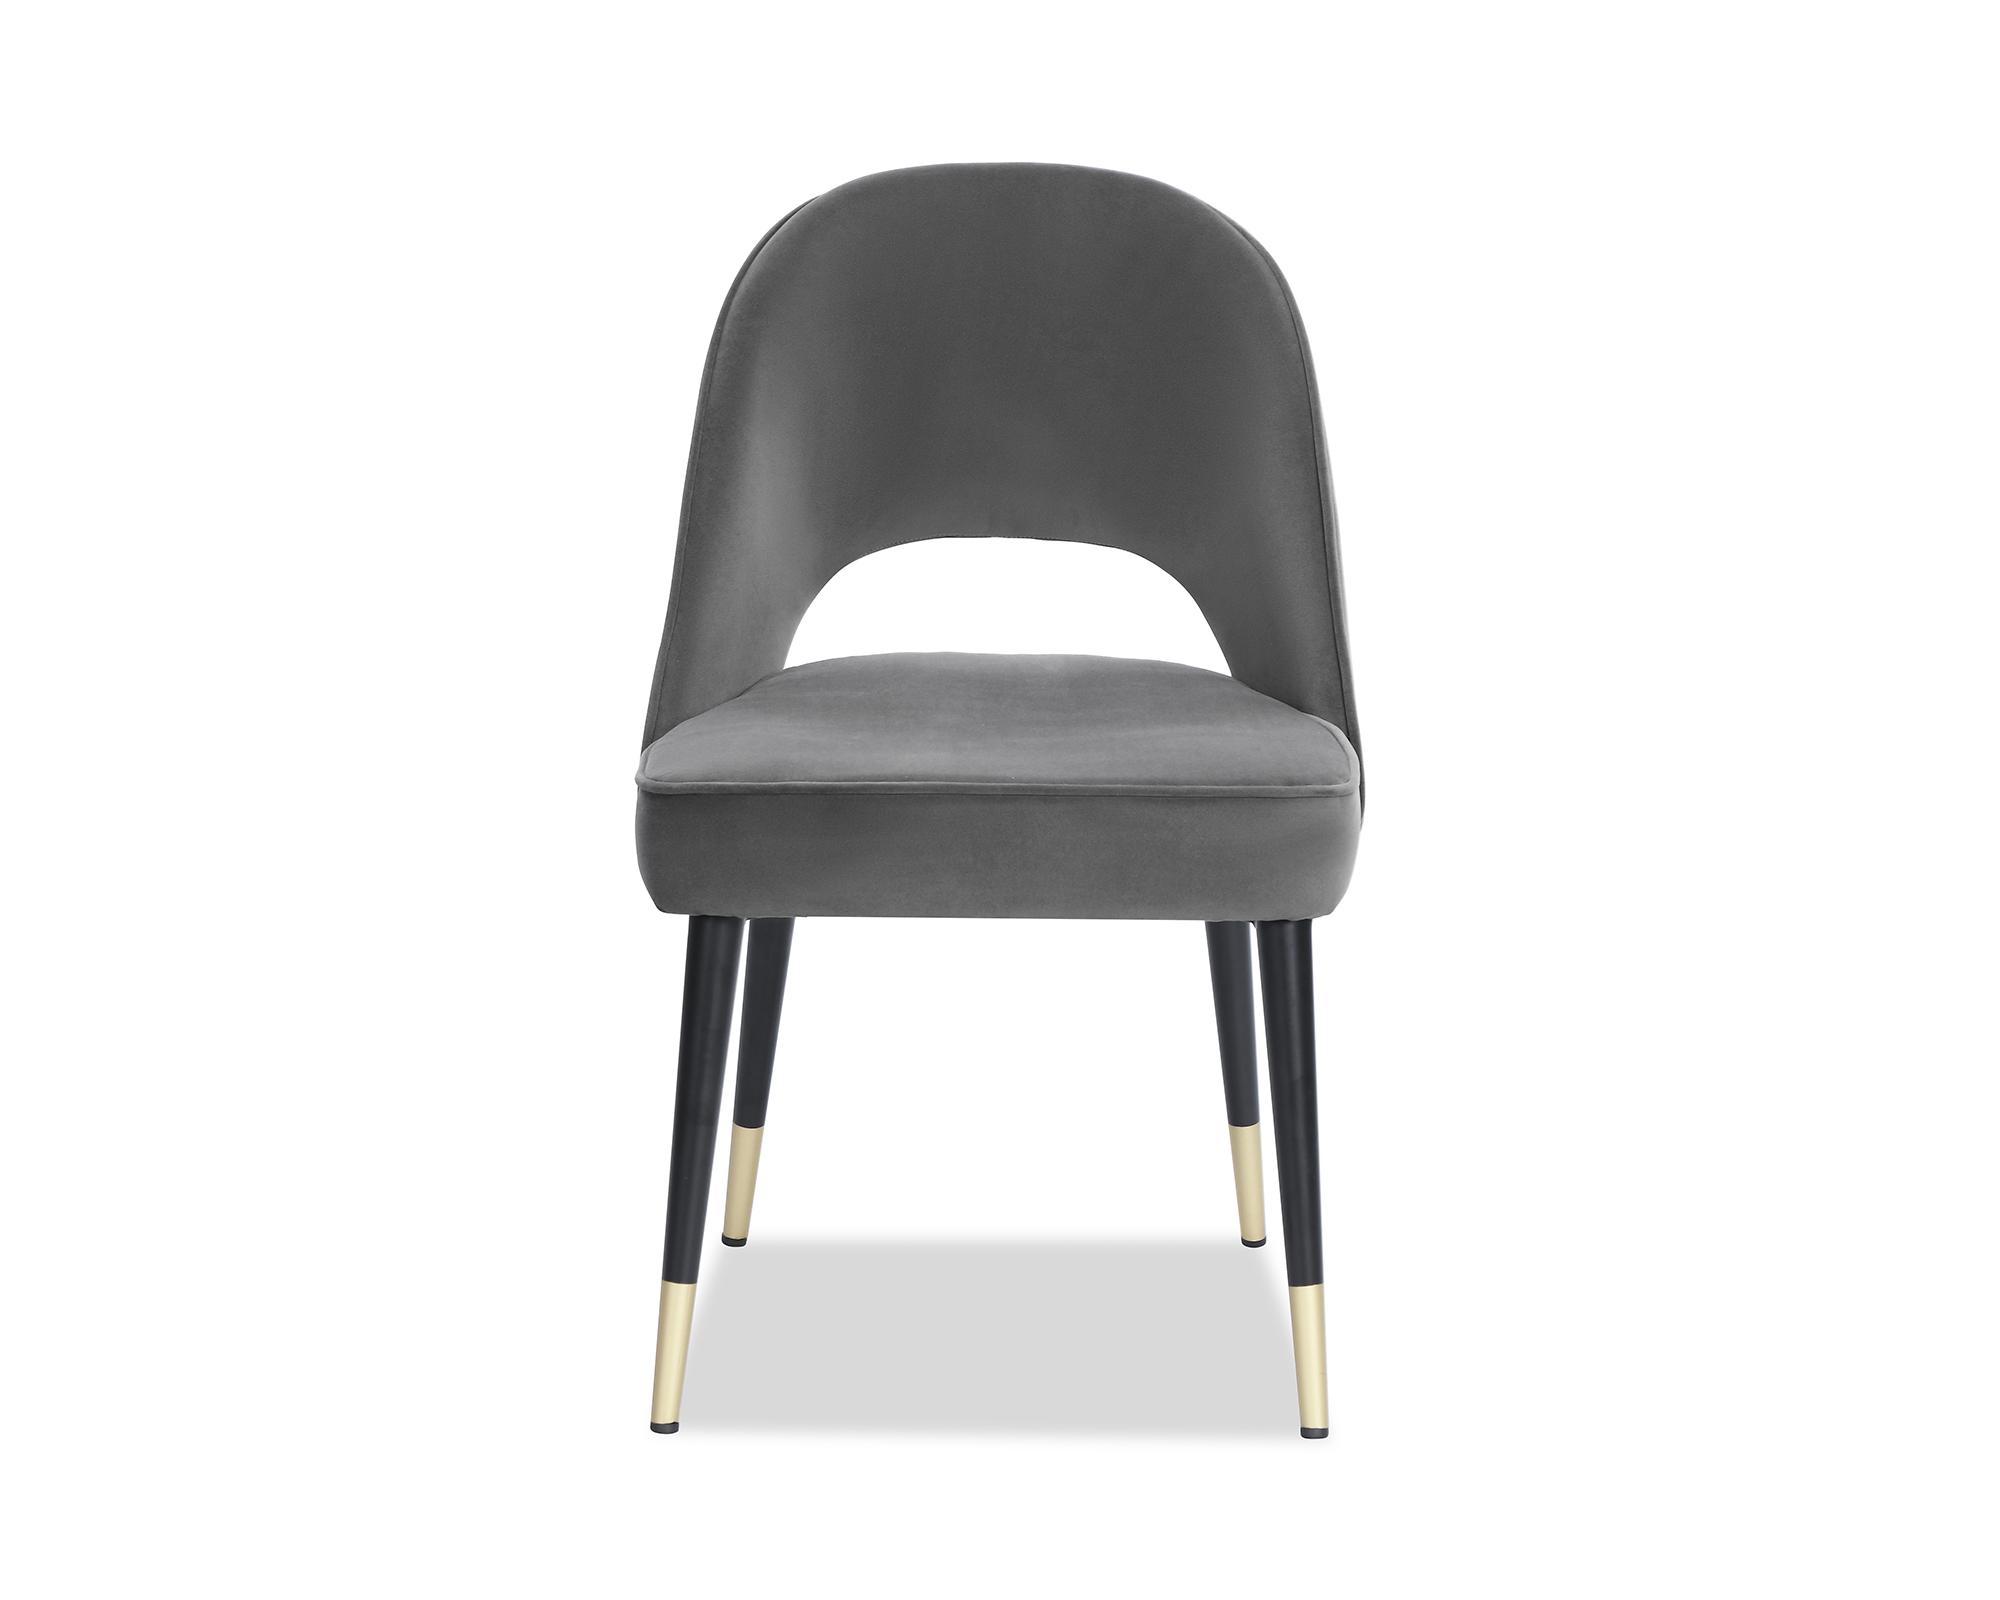 Liang & Eimil GV-DCH-007 Yvees Chair (2)